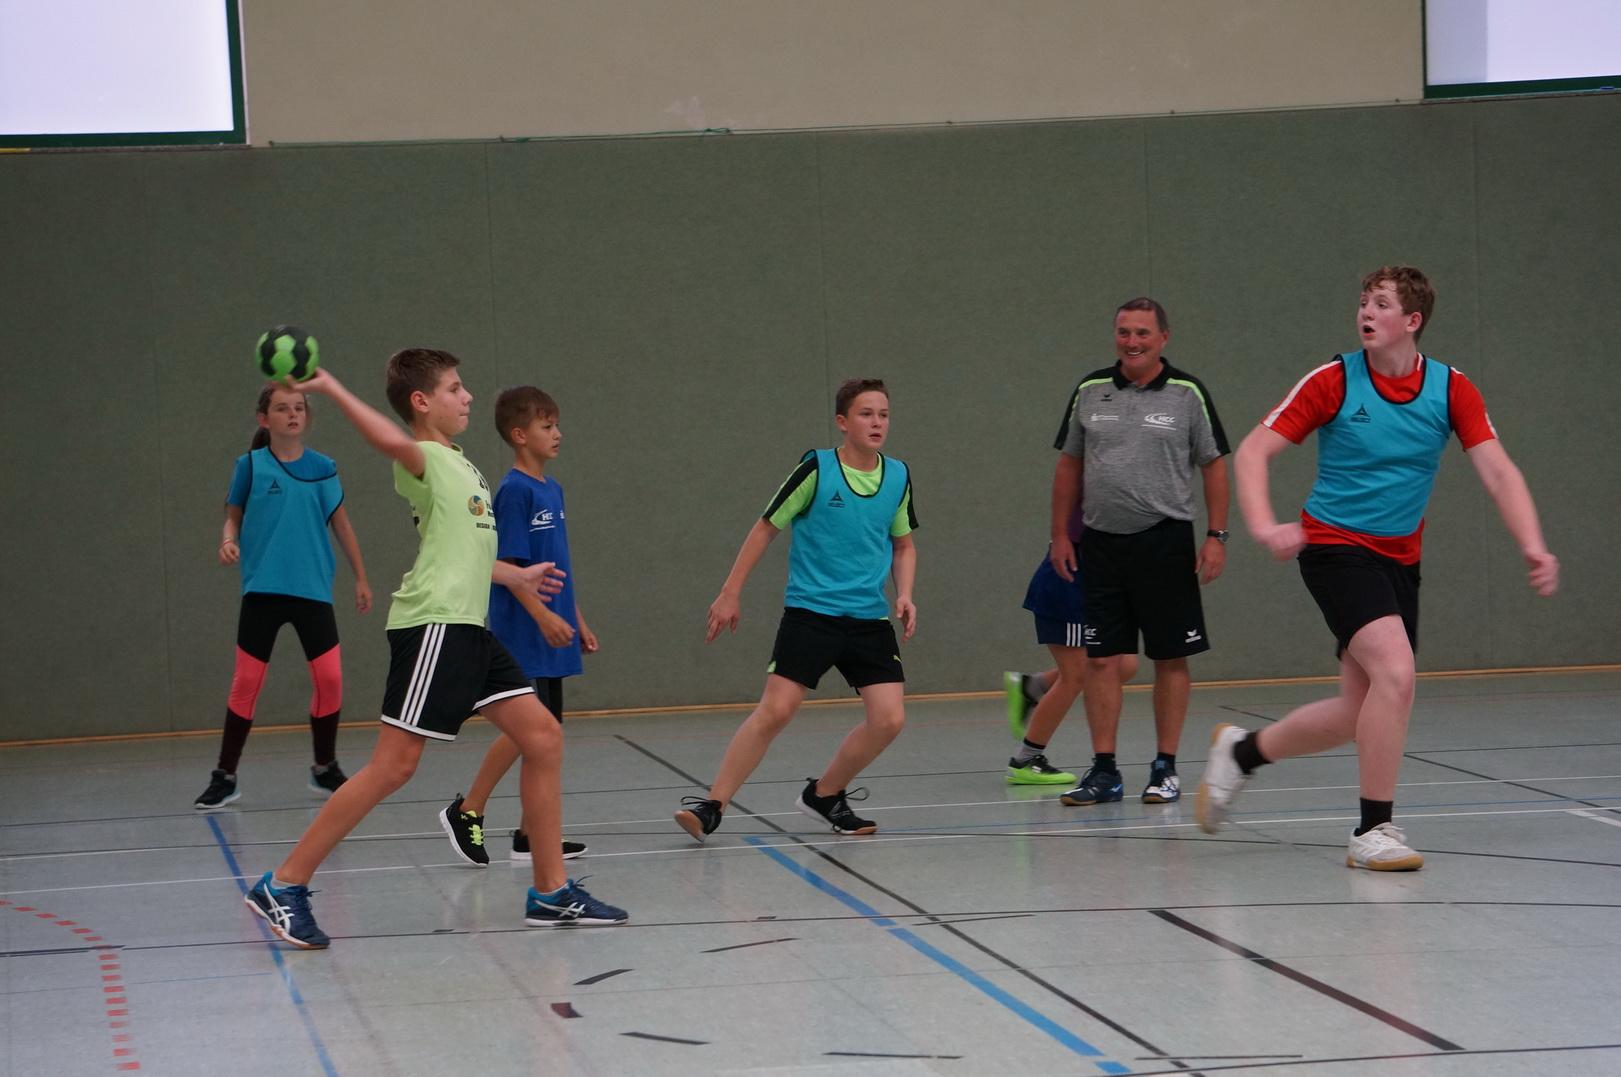 201808_Handballcamp_SDH_MG_111w